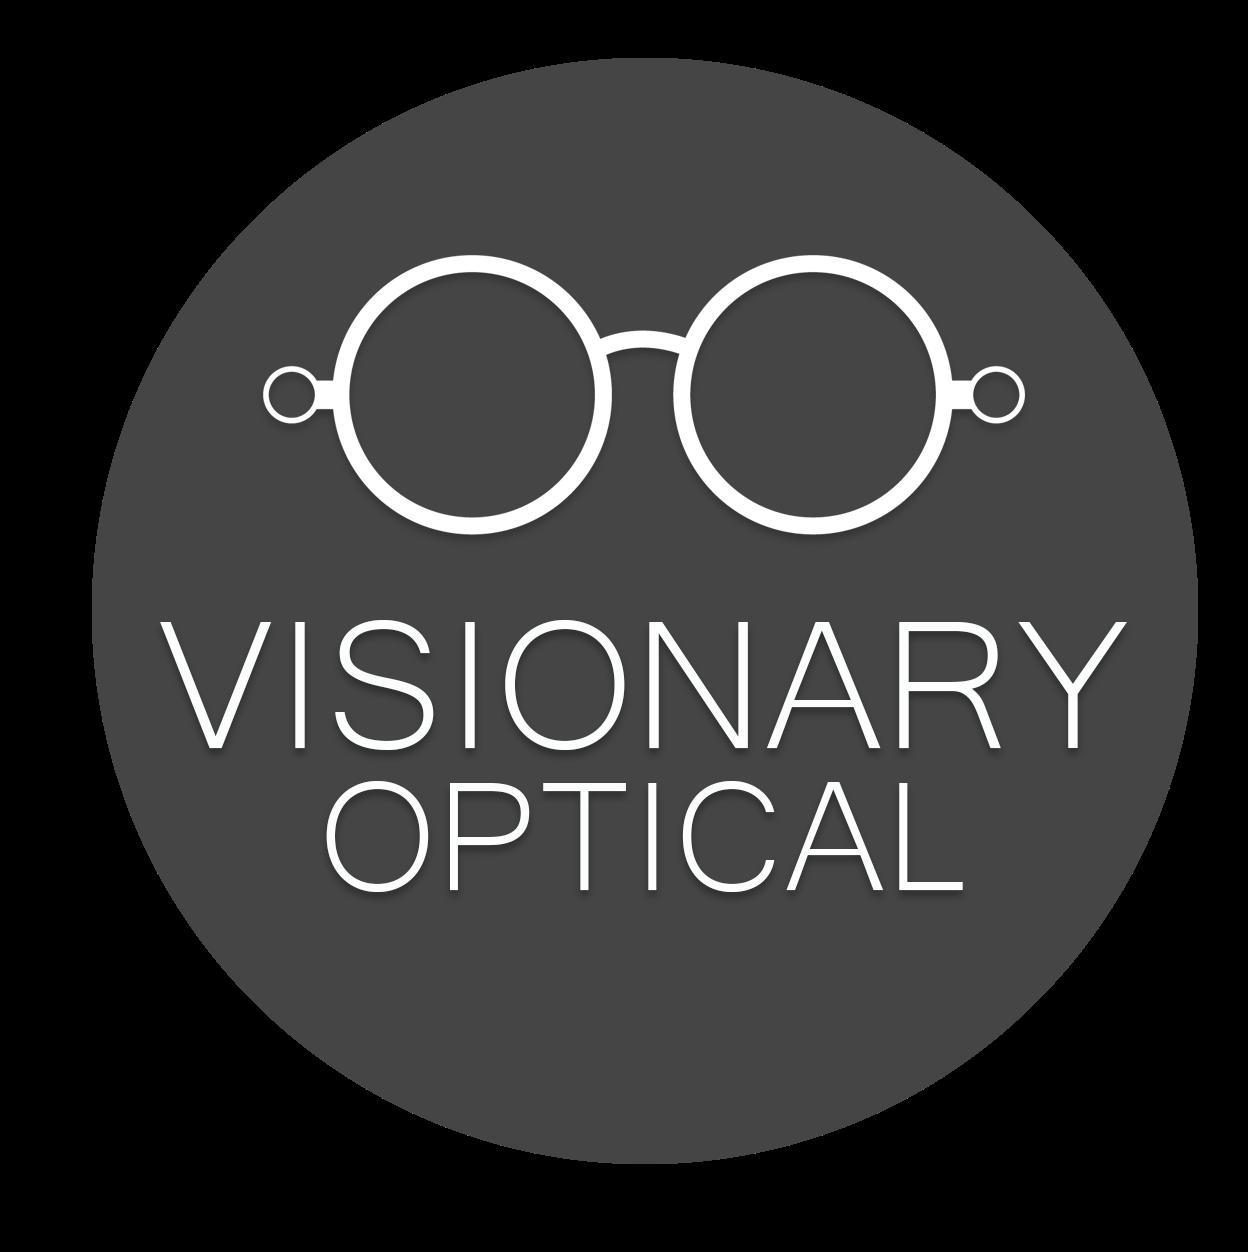 logo for Visionary Optical Optometrists